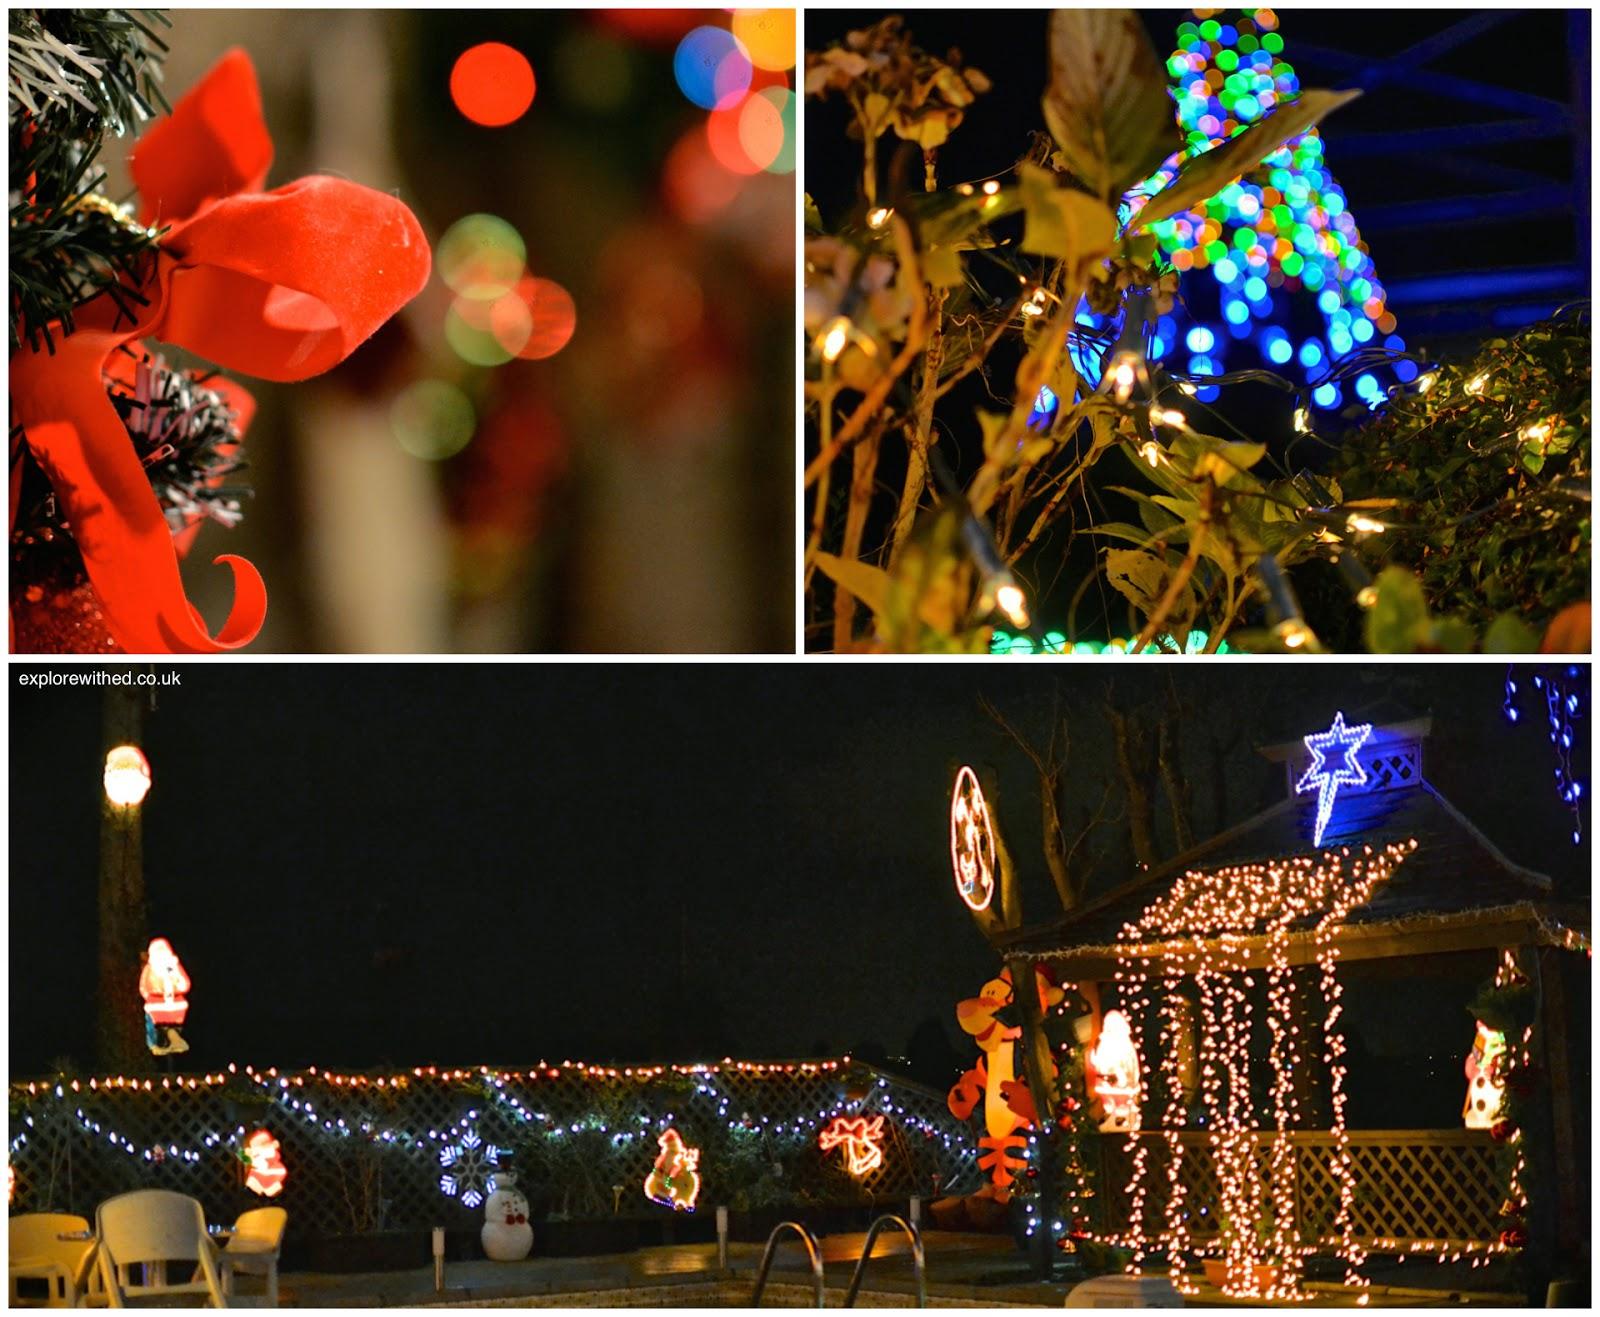 Festive garden ornaments